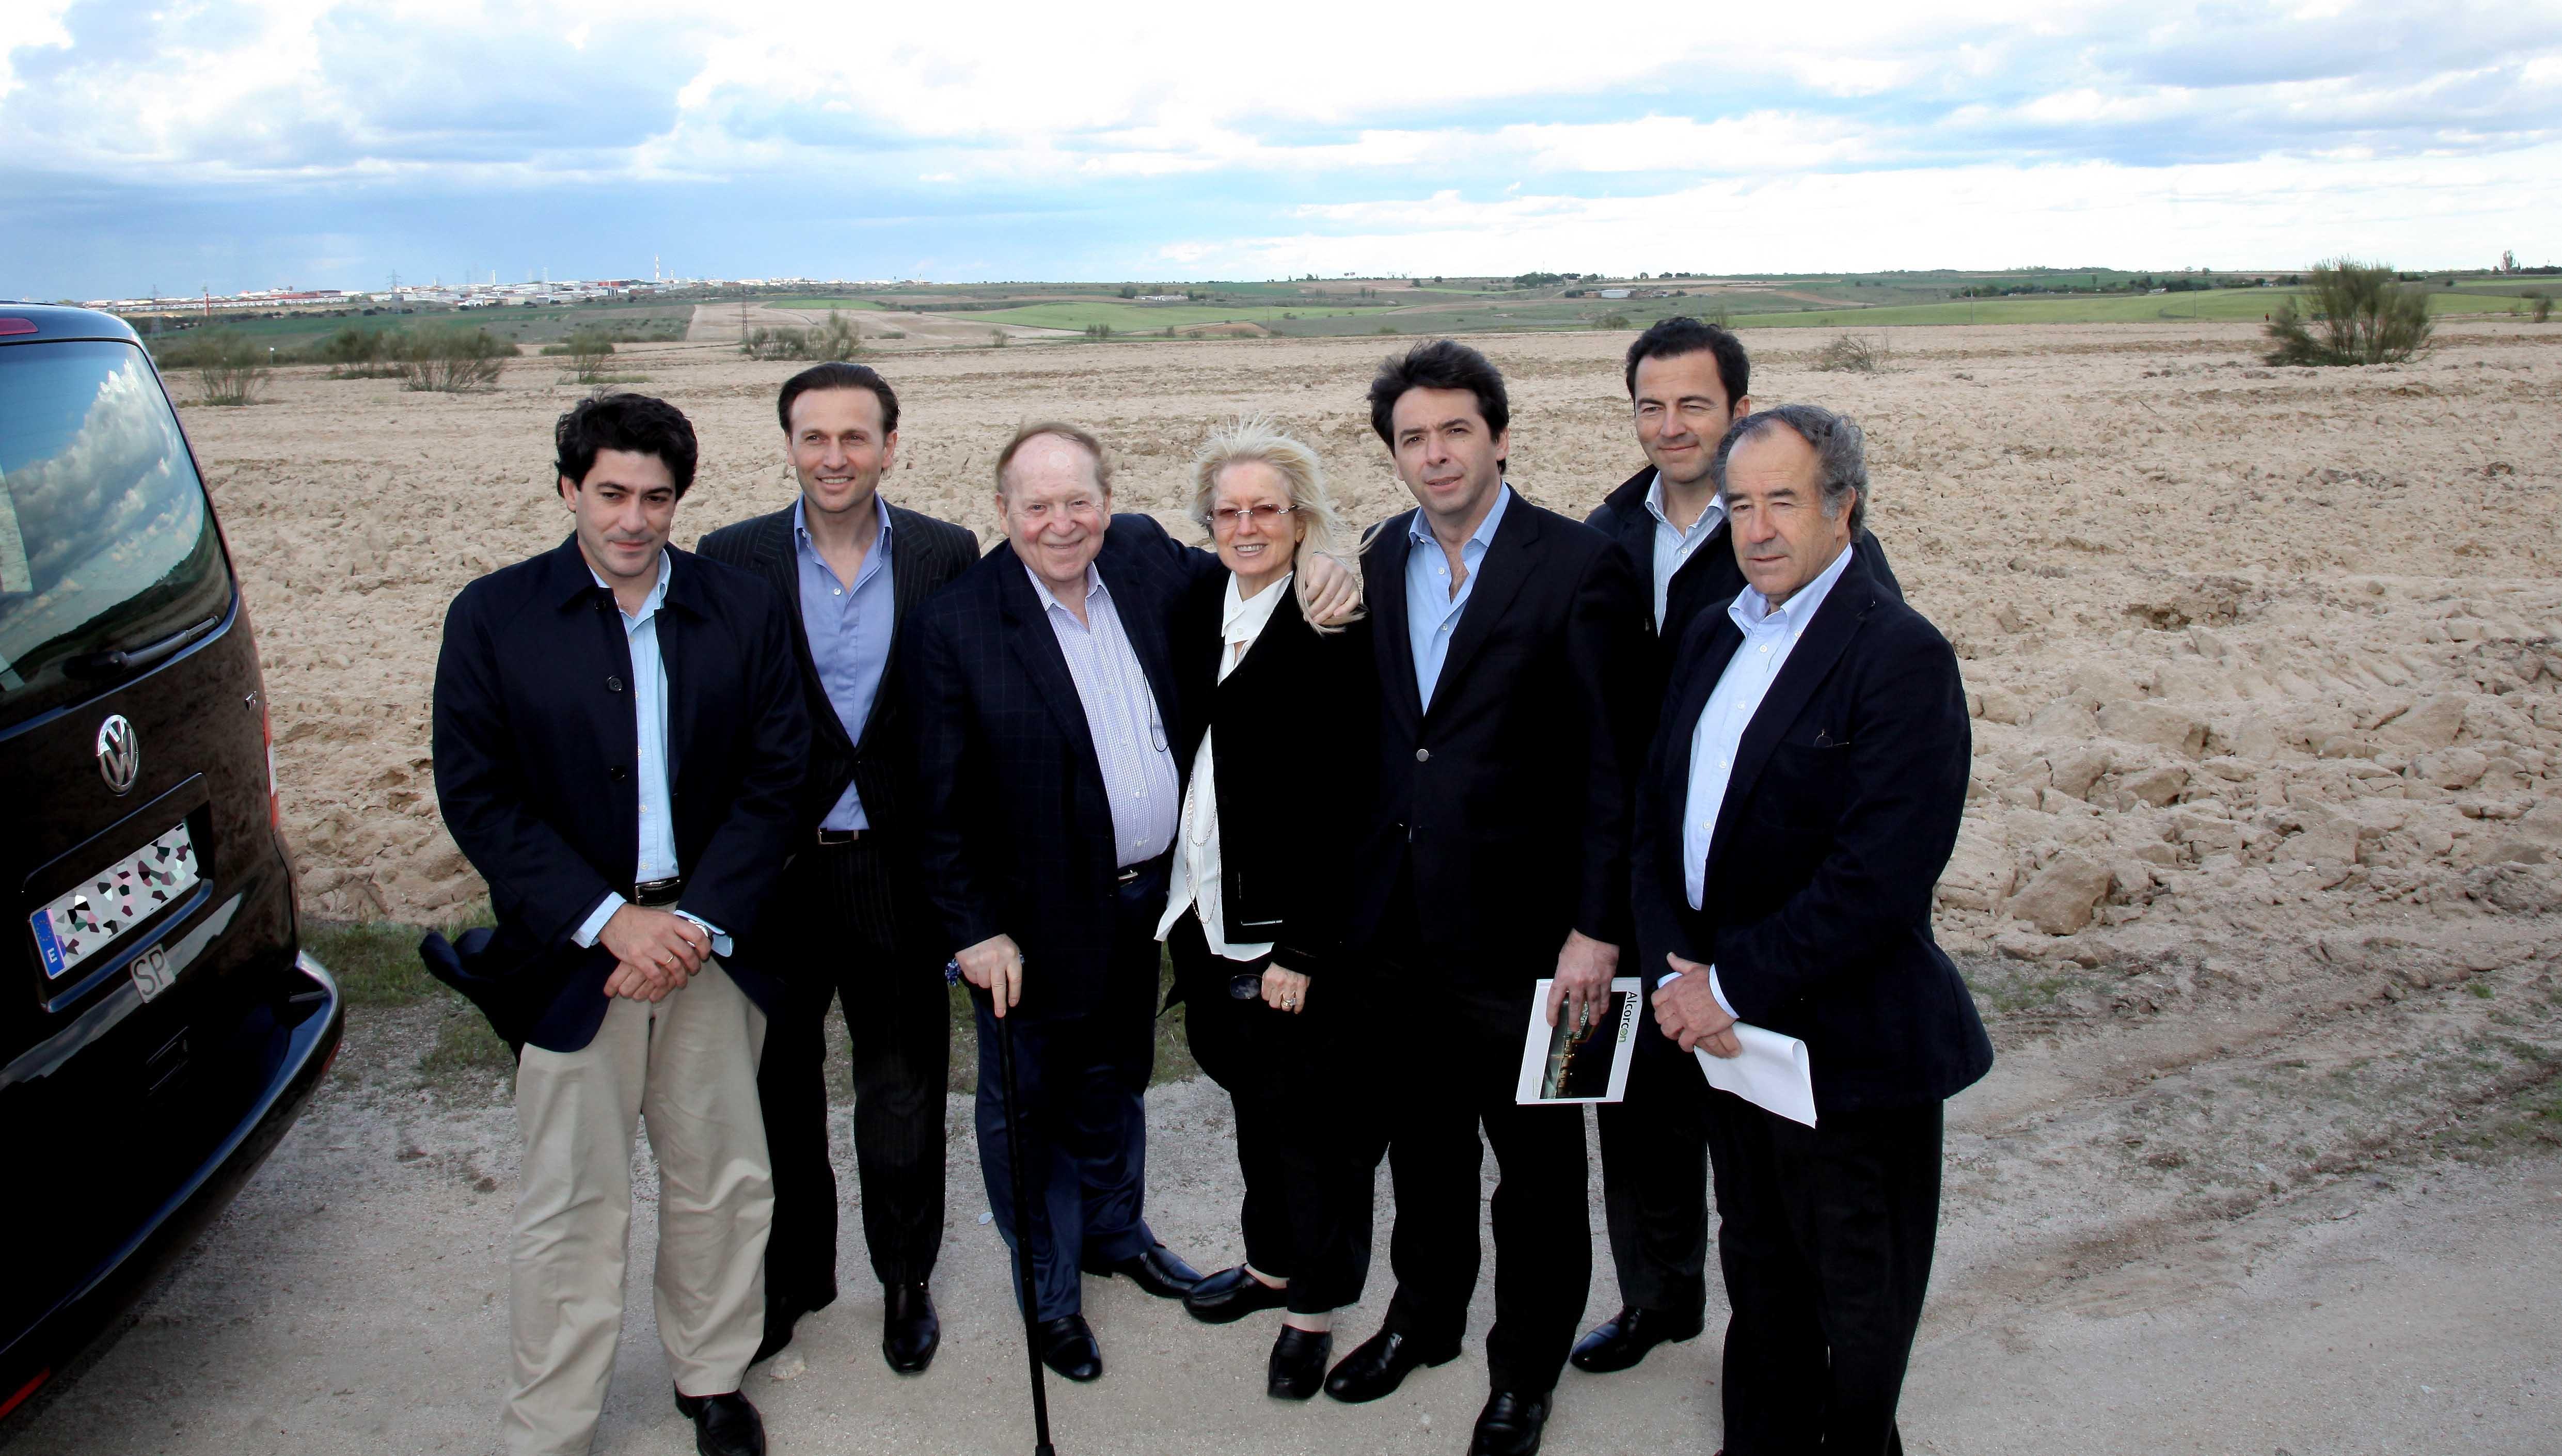 sheldon adelson con el alcalde de alcorcón